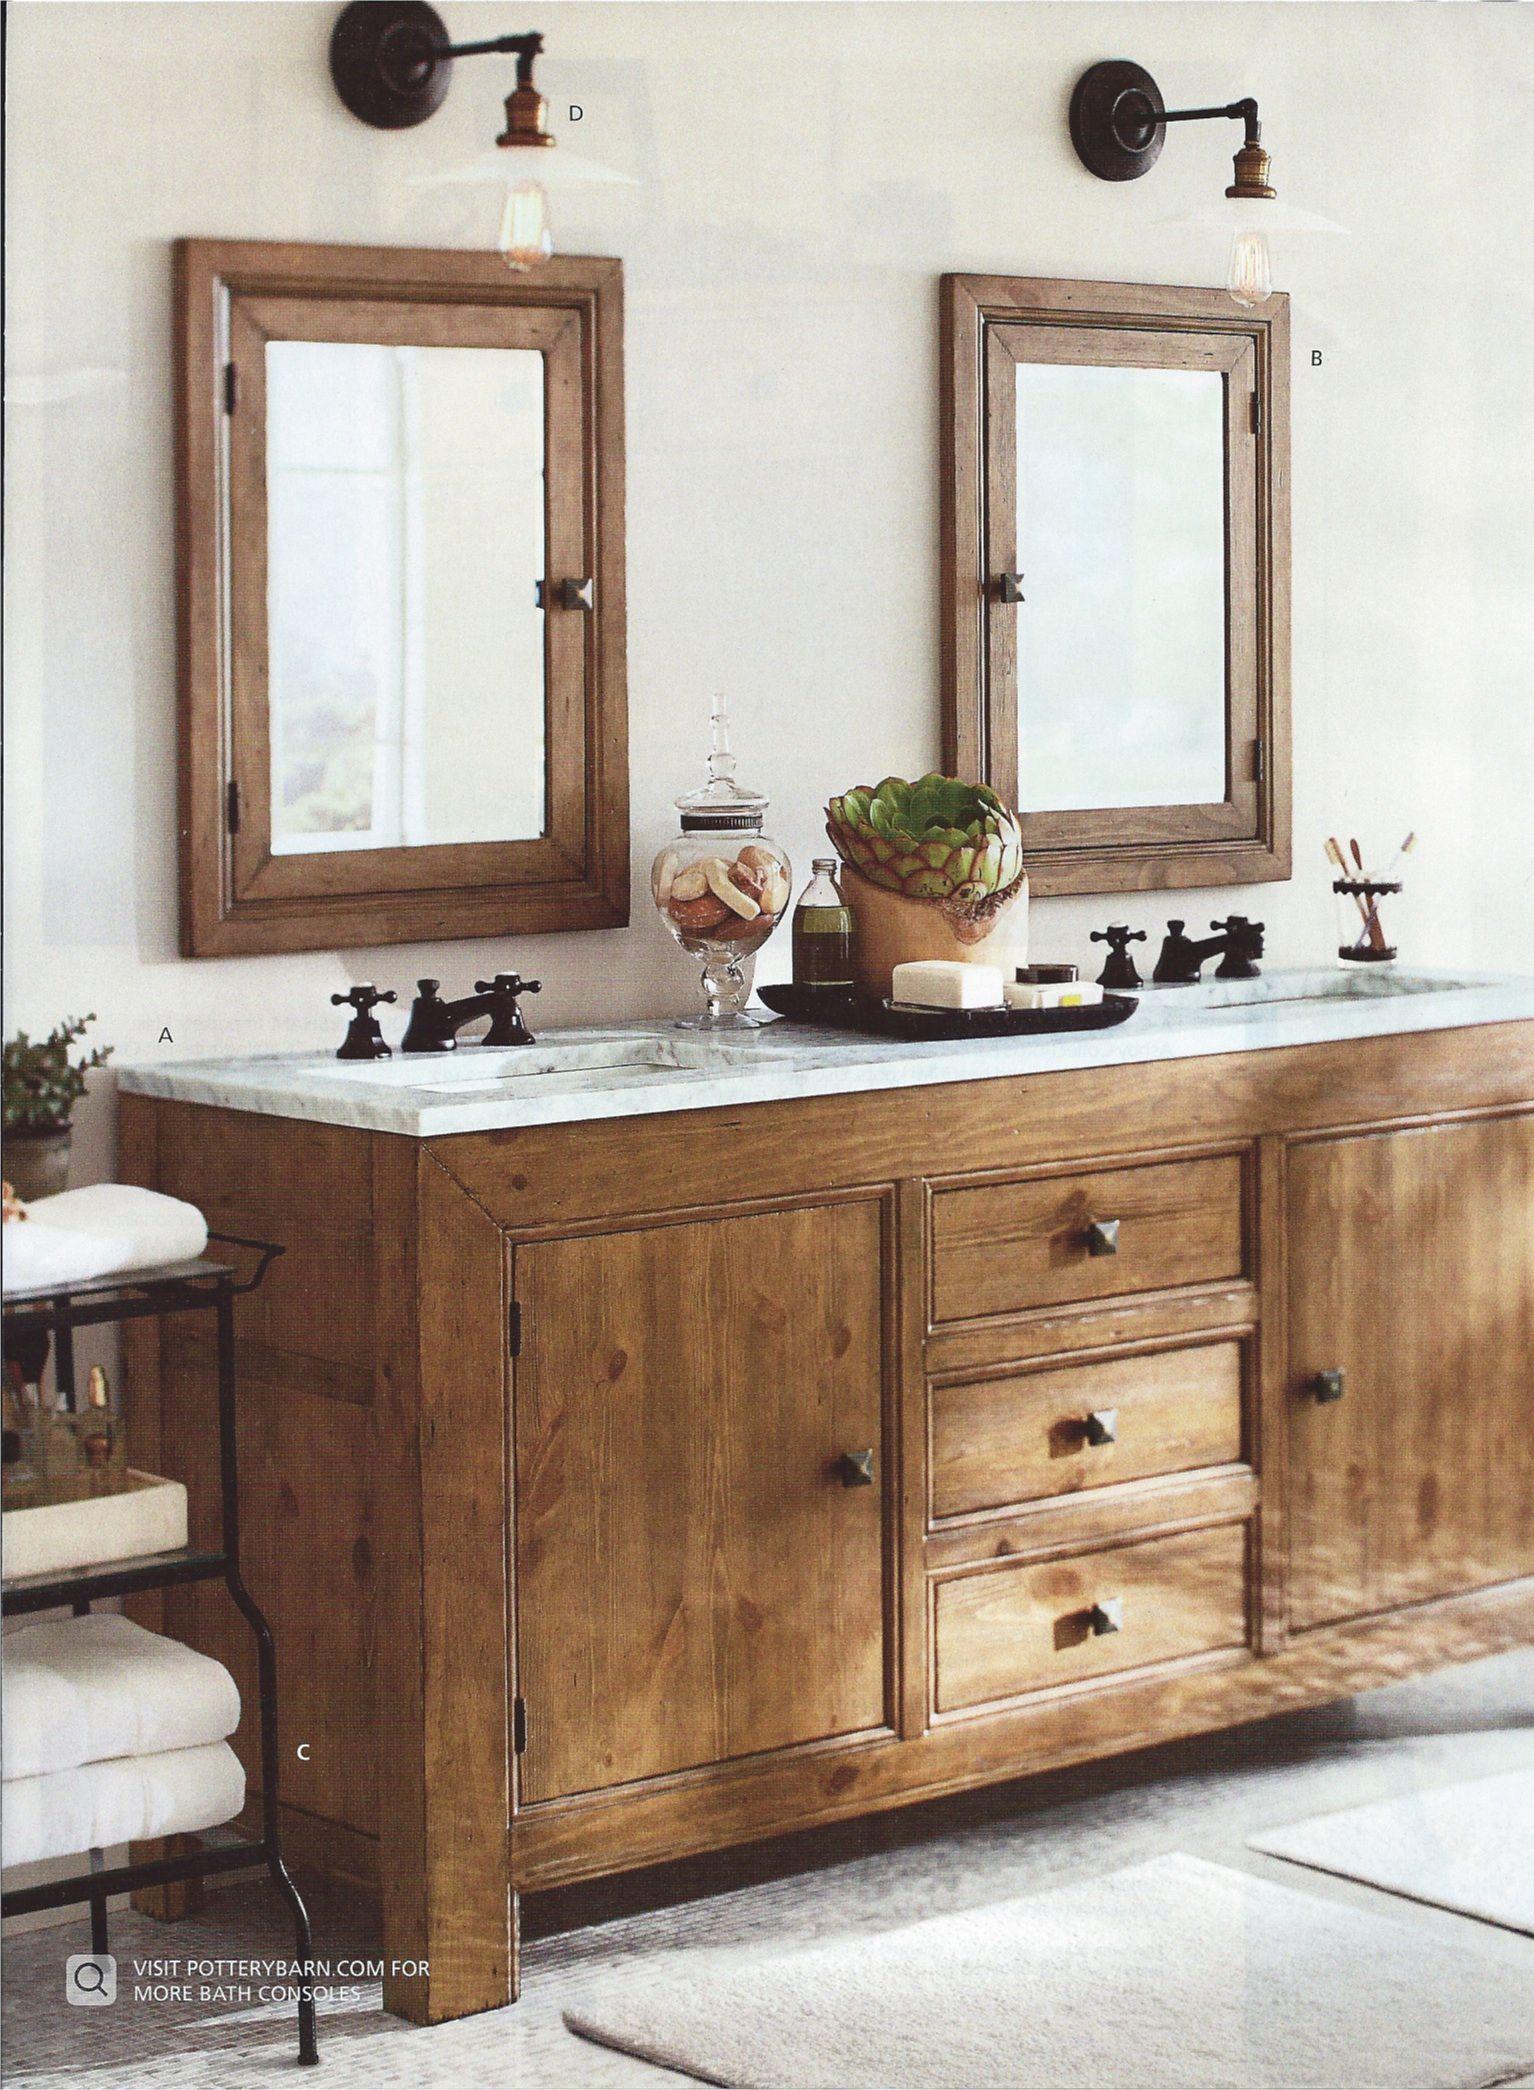 Rustic Bathroom Medicine Cabinet Mirror Bathroom Vanity Designs Bathroom Vanity Decor Rustic Bathroom Vanities